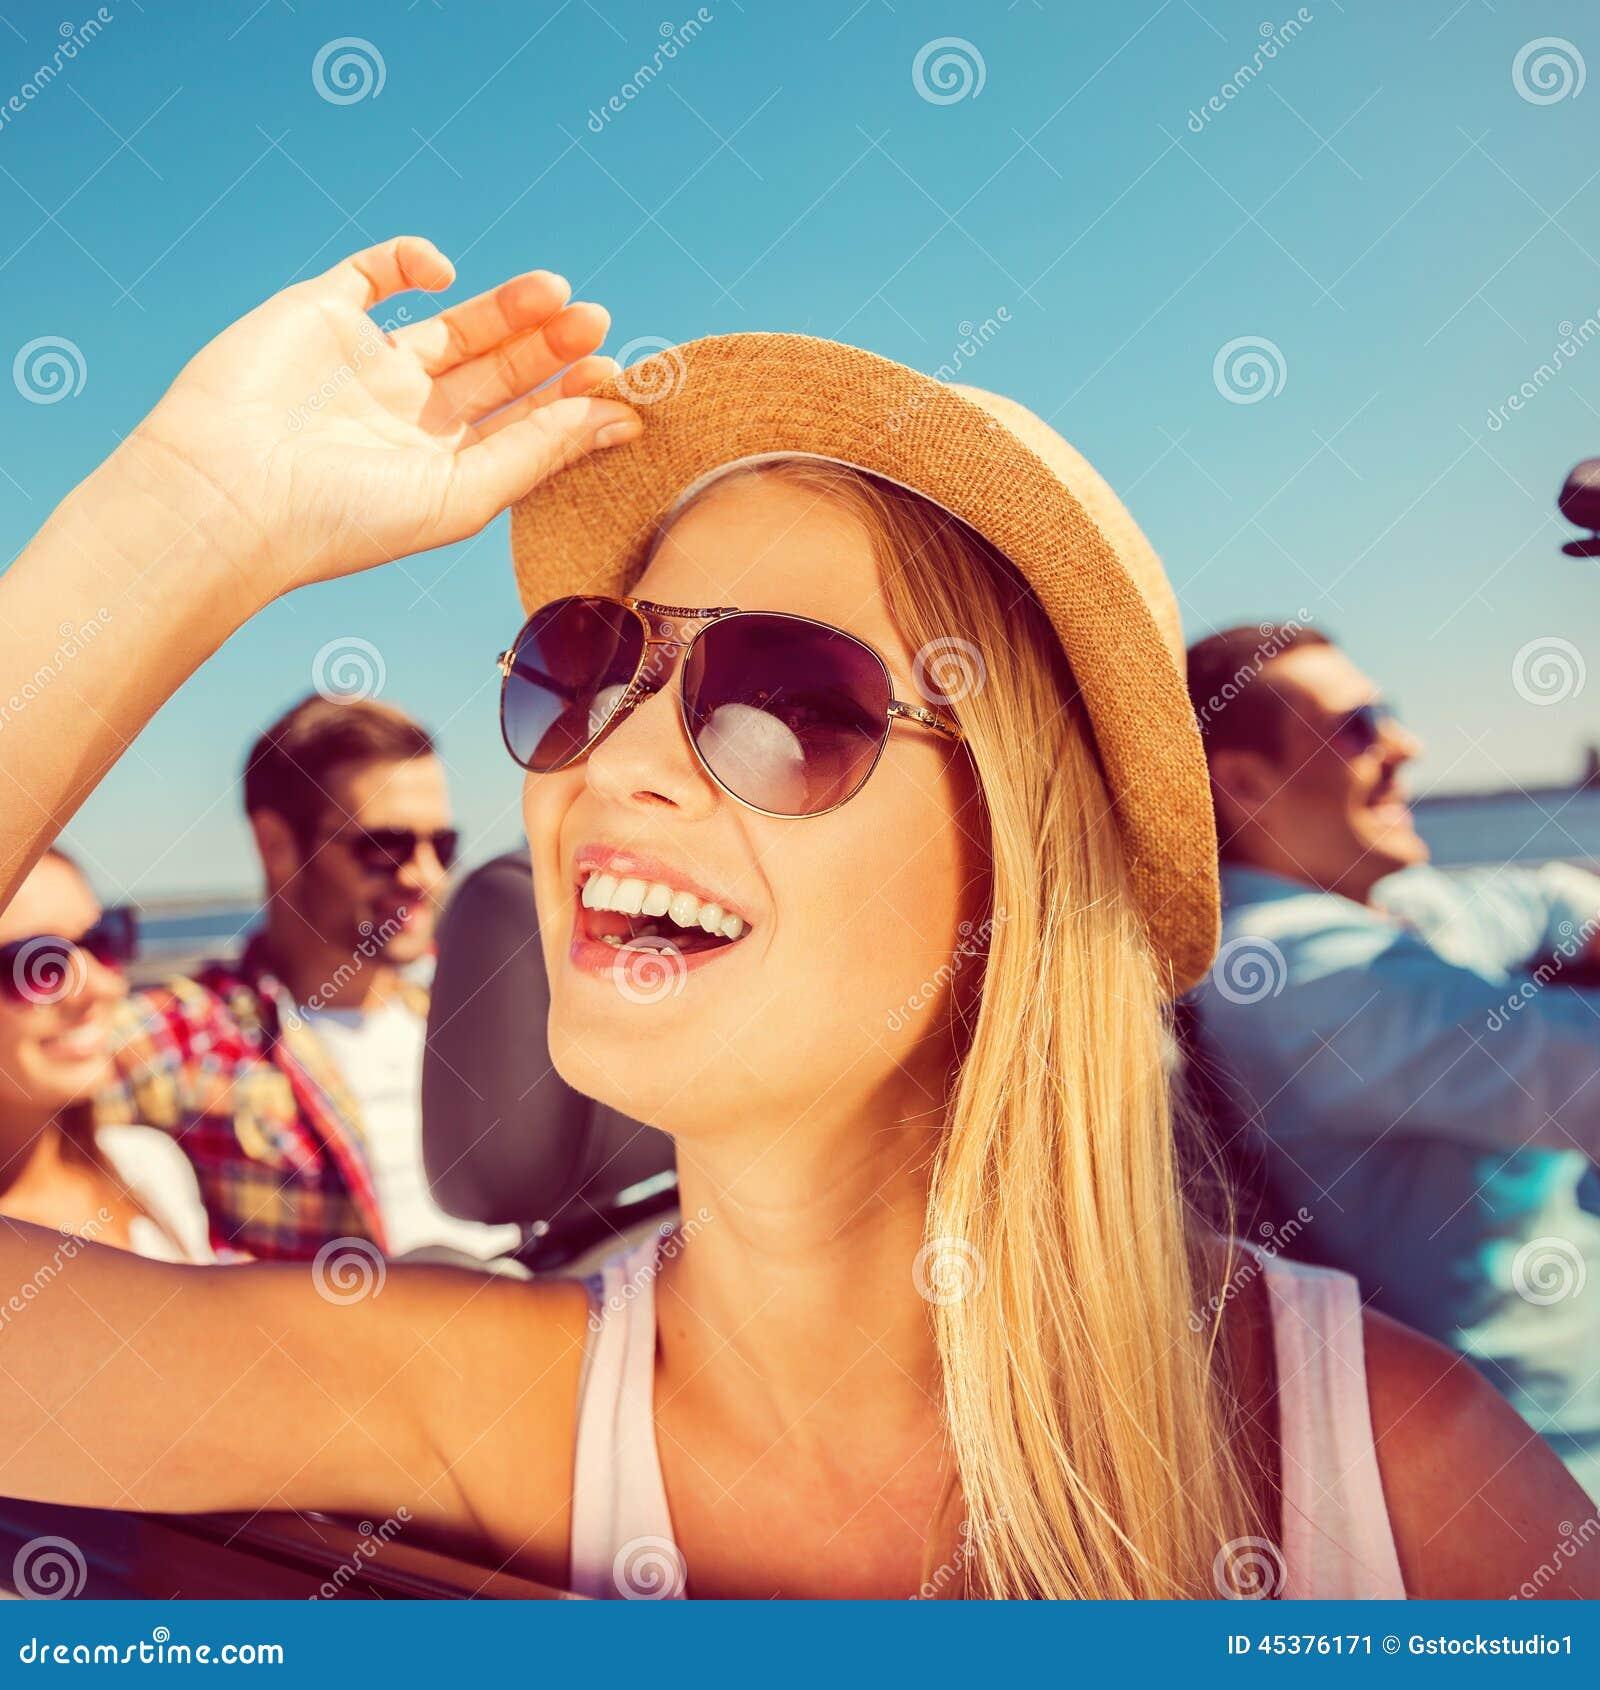 Happy Beautiful Woman Enjoying At Beach Stock Photo: Enjoying Her Trip. Stock Image. Image Of Adjusting